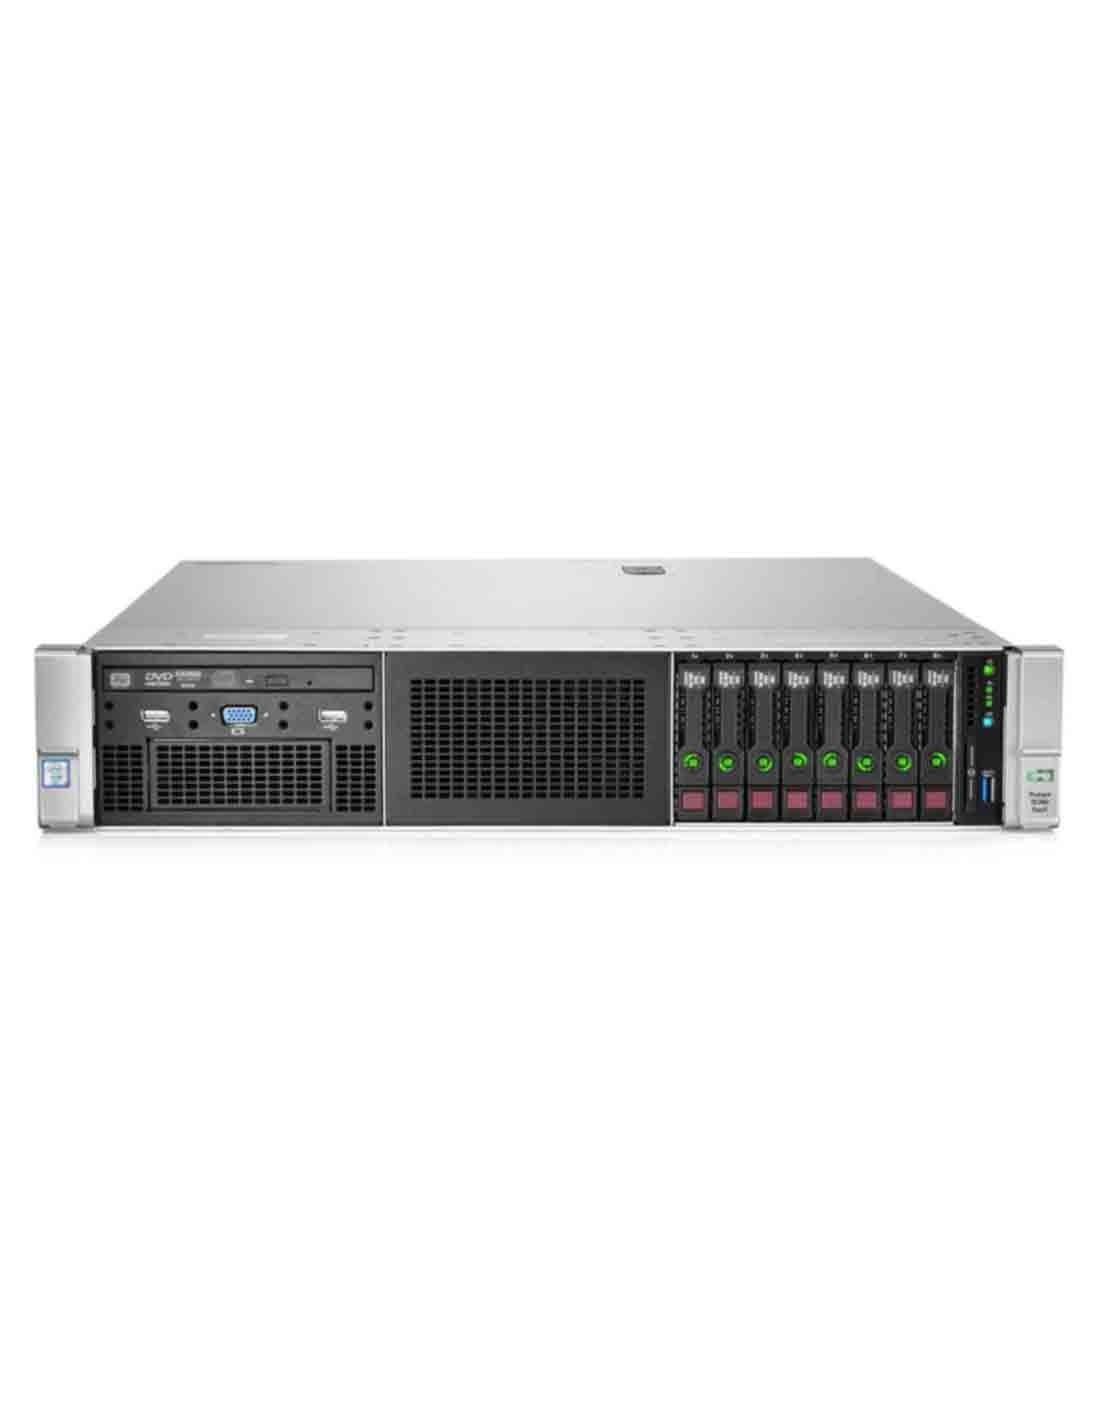 HP ProLiant DL380 Gen9 E5-2620v4 Cheaper